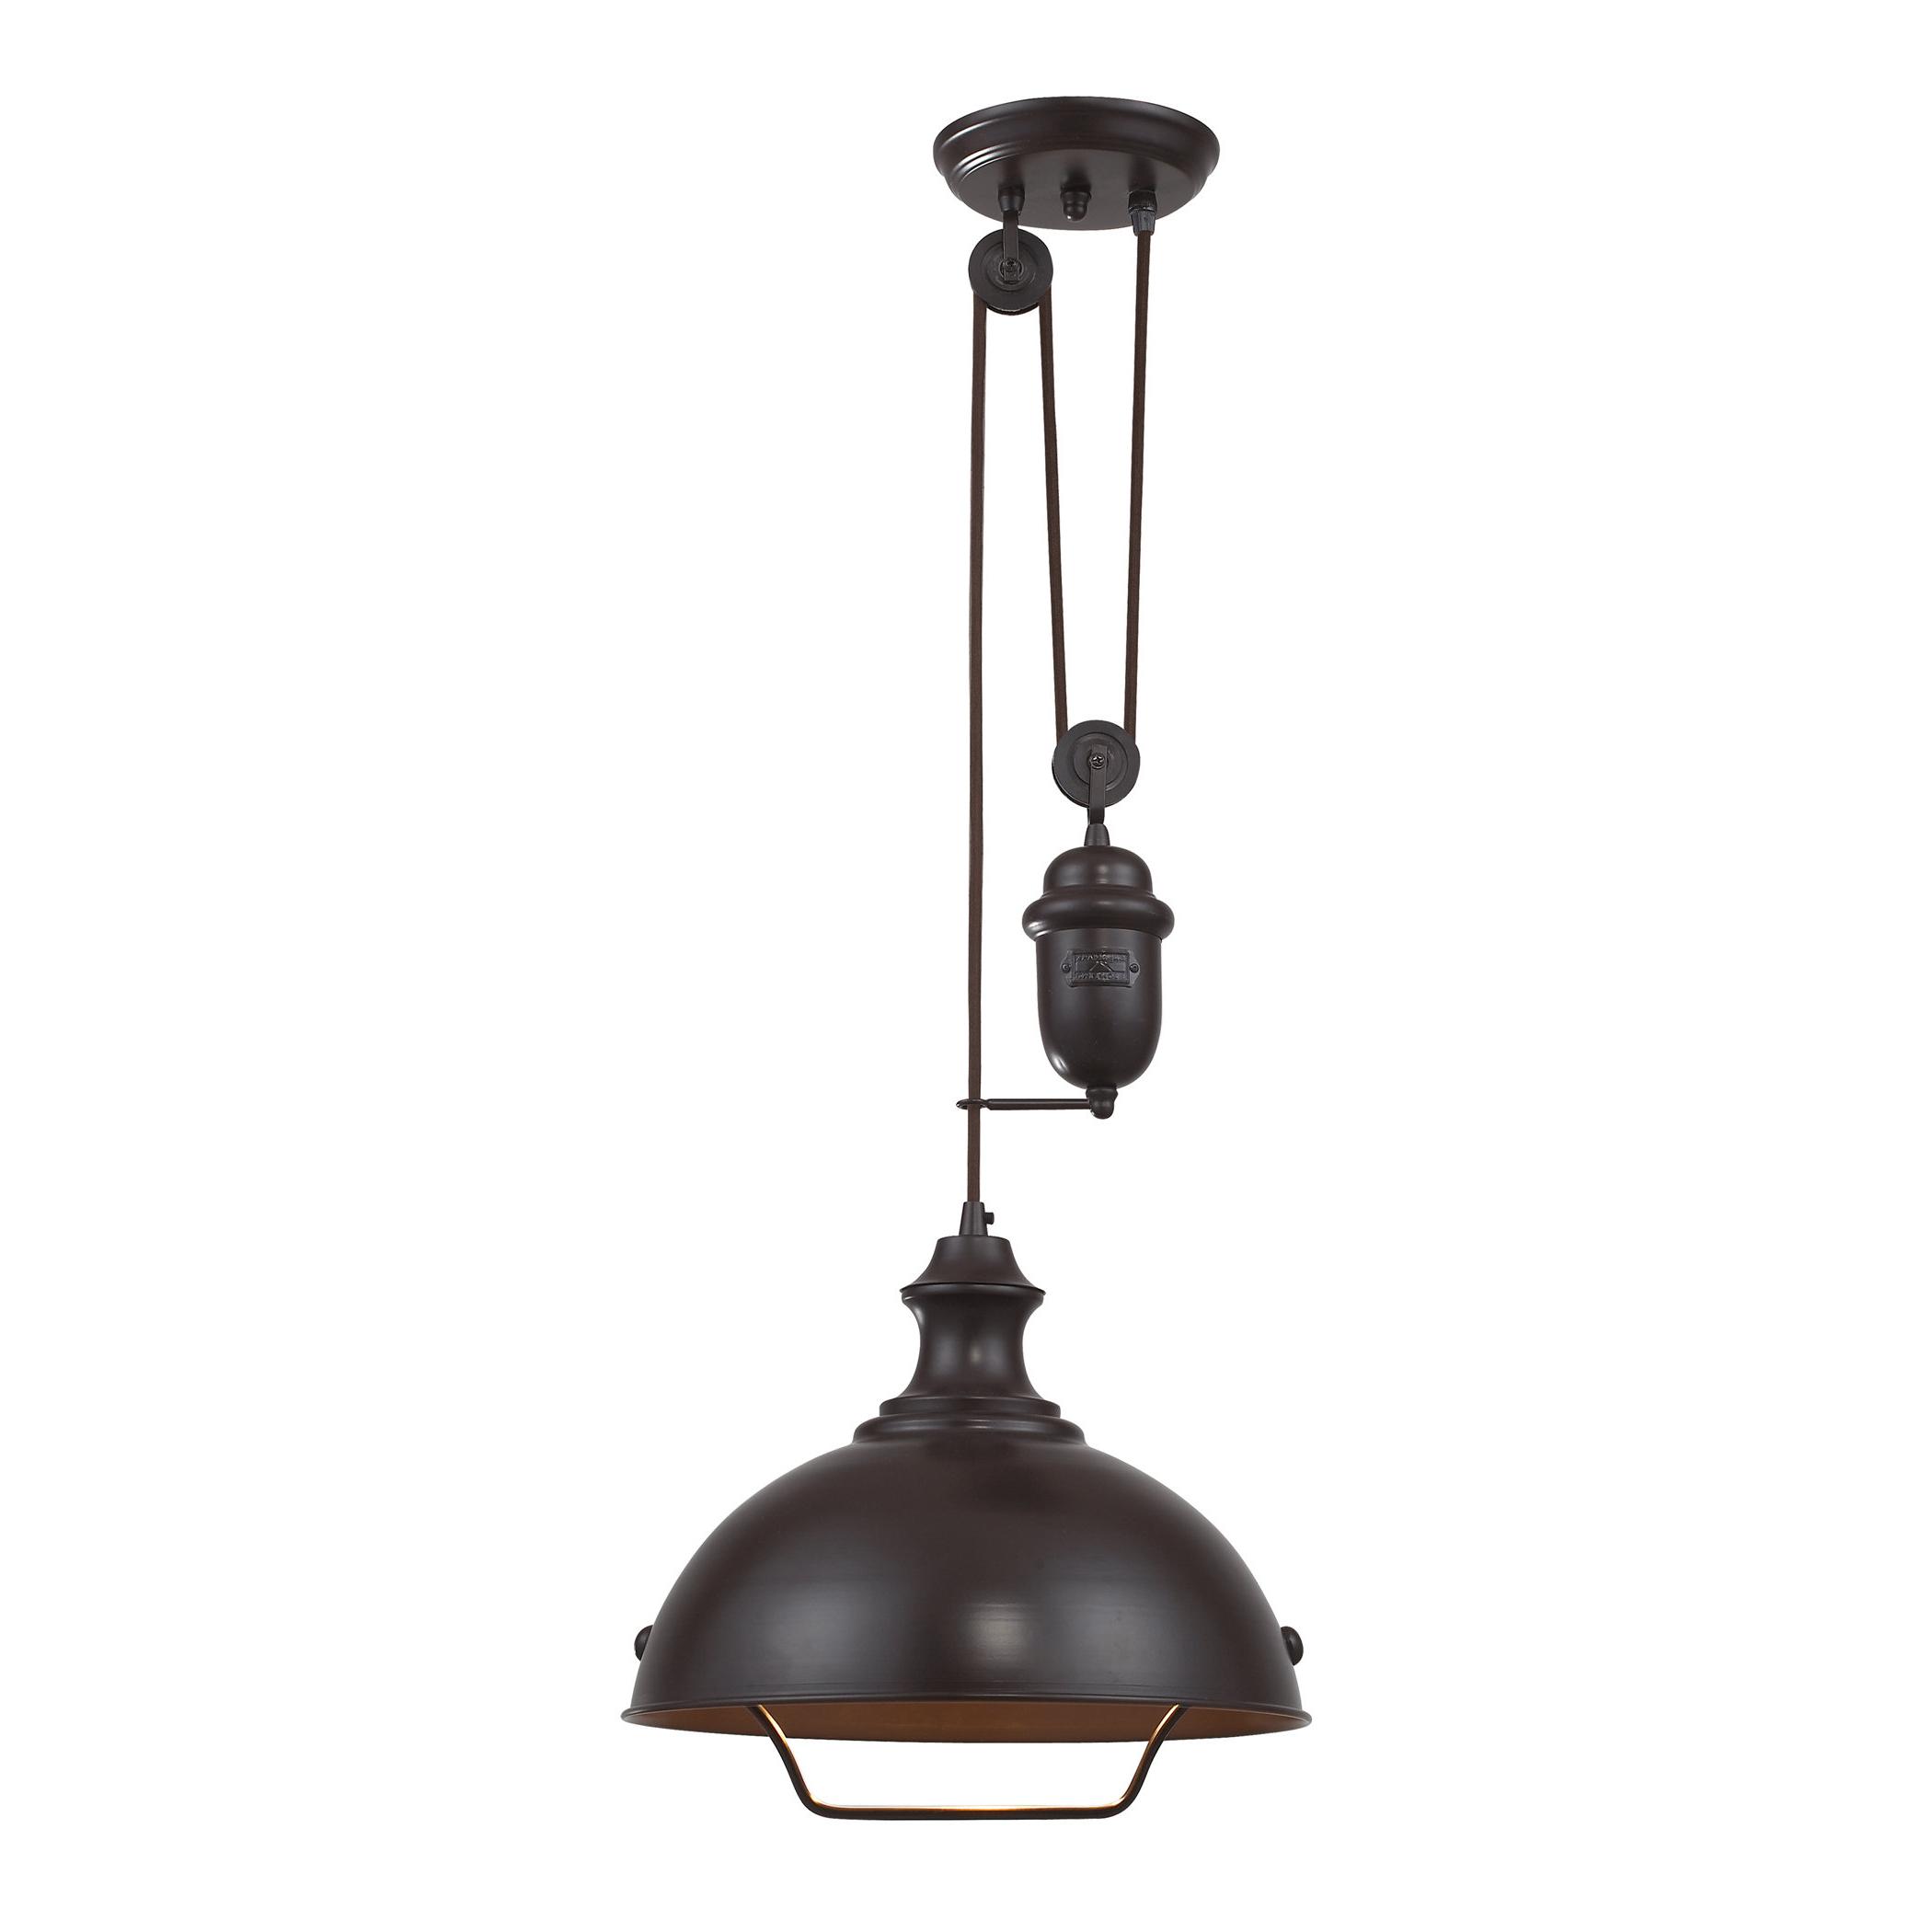 Current Legrand 1 Light Single Dome Pendant With Demi 1 Light Globe Pendants (View 12 of 20)